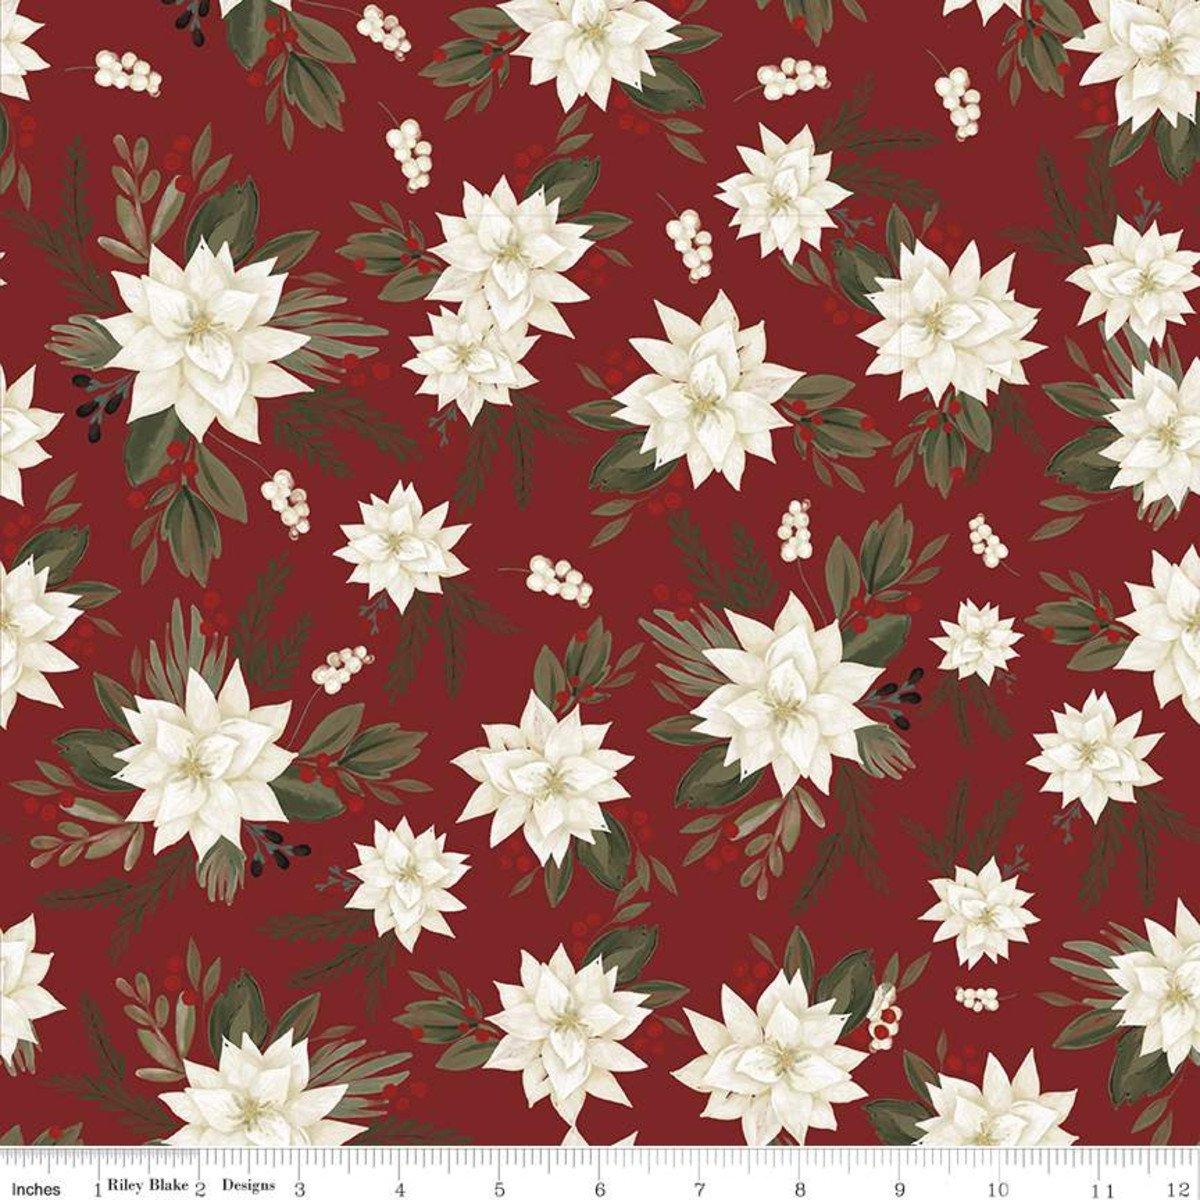 Farmhouse Christmas Poinsettias C10950 Red